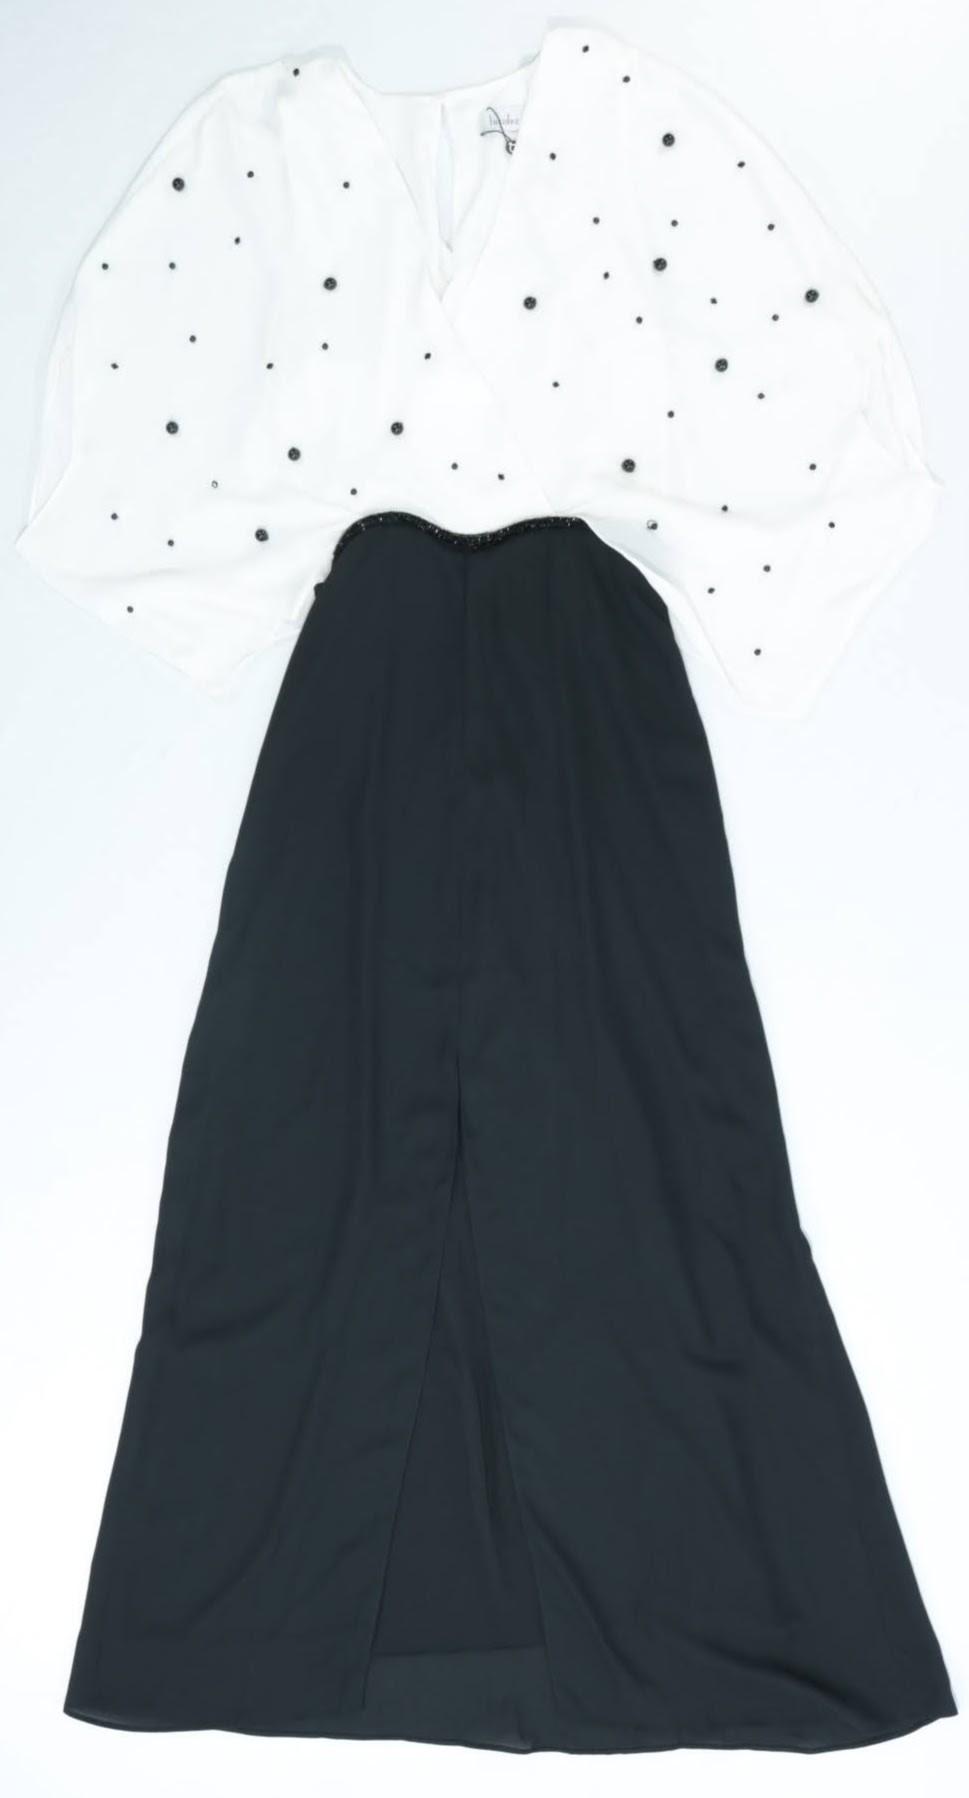 Vestido Longo - Lucidez - M